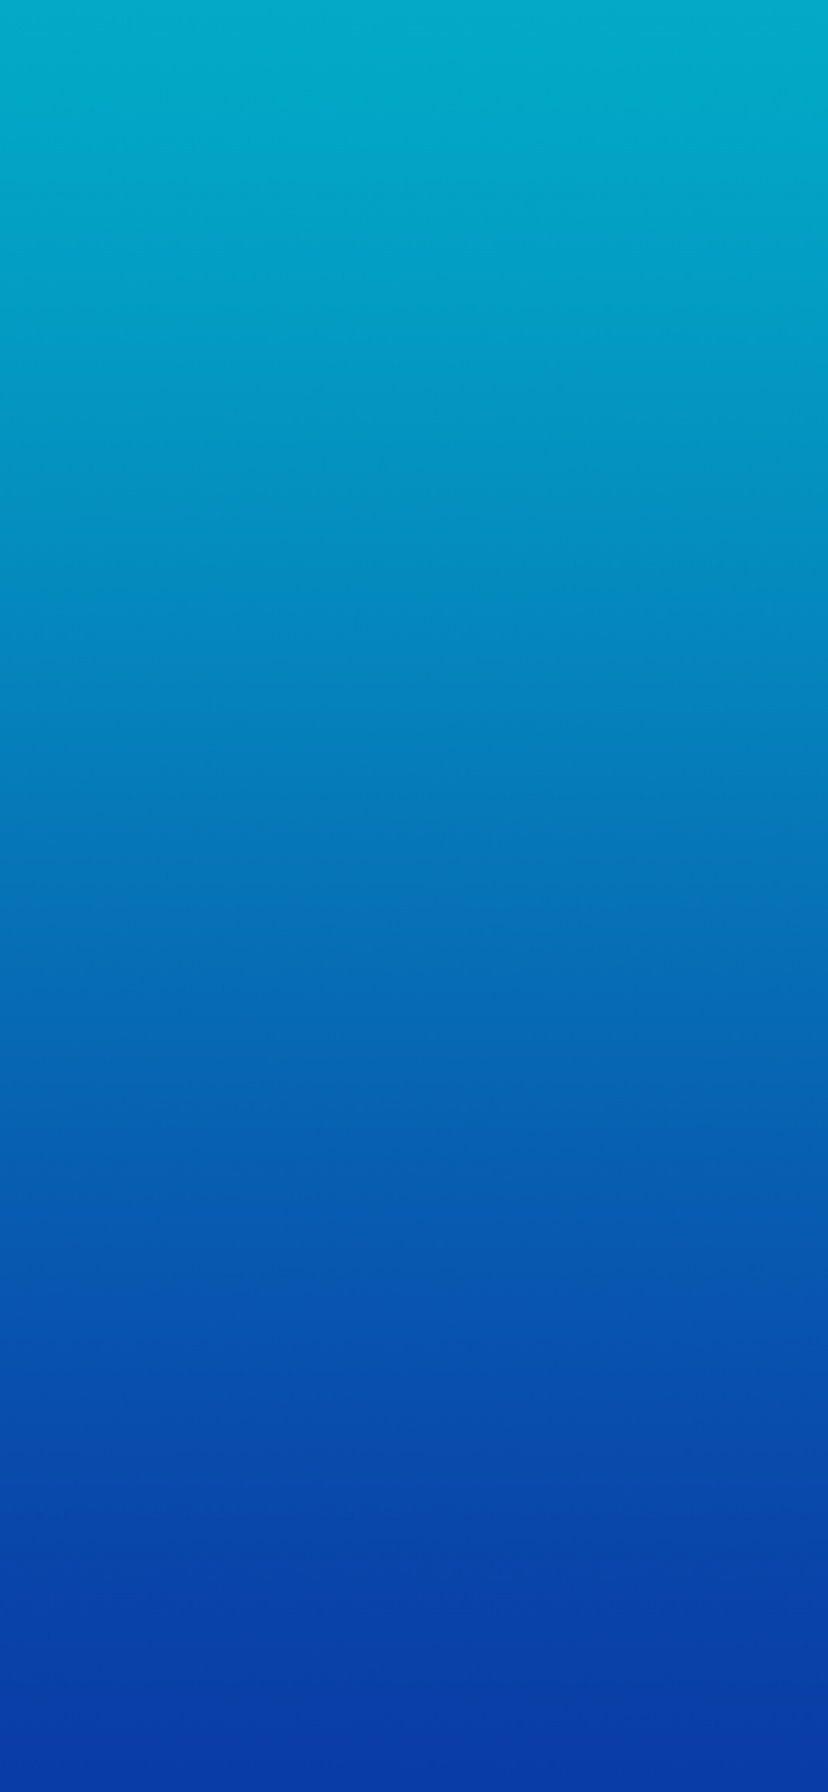 Wallpapers Iphone Xr Pack 1 Blue Wallpaper Iphone Android Wallpaper Iphone Wallpaper